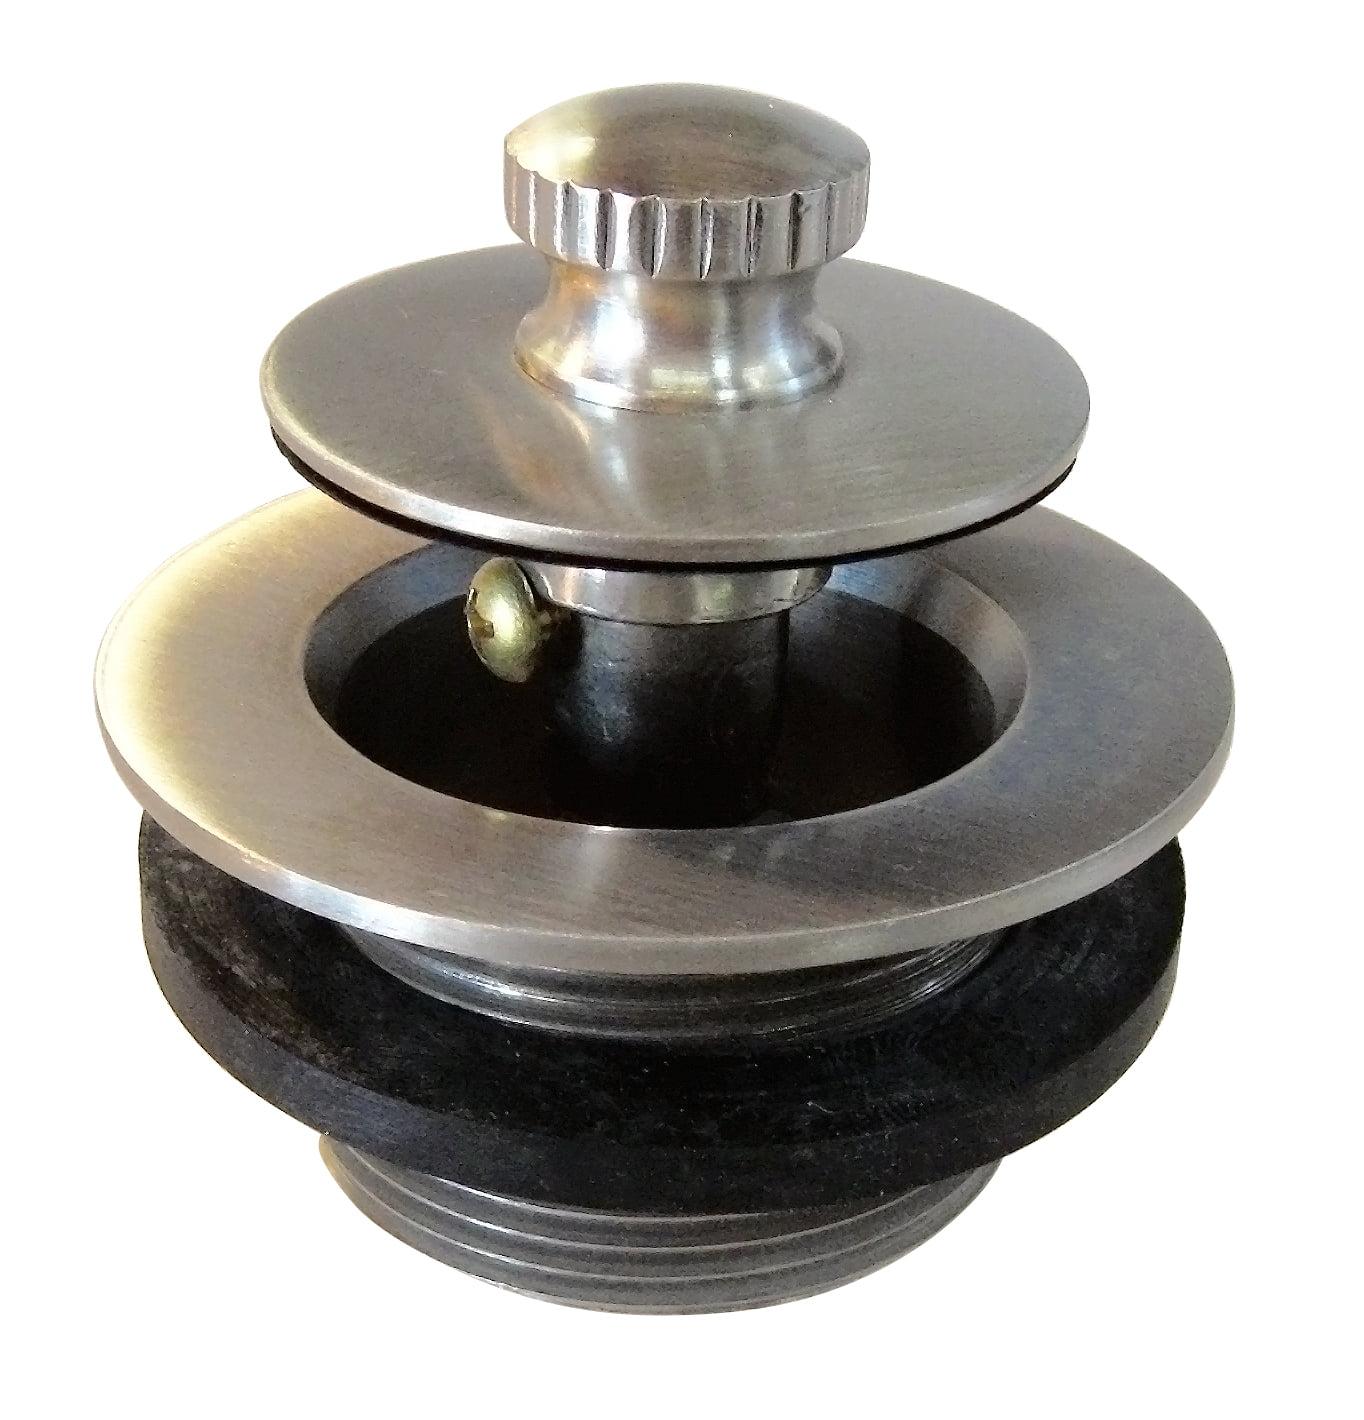 Westbrass Twist & Close 1-1/2 in. NPSM Coarse Thread Bath Drain D331 in Stainless Steel